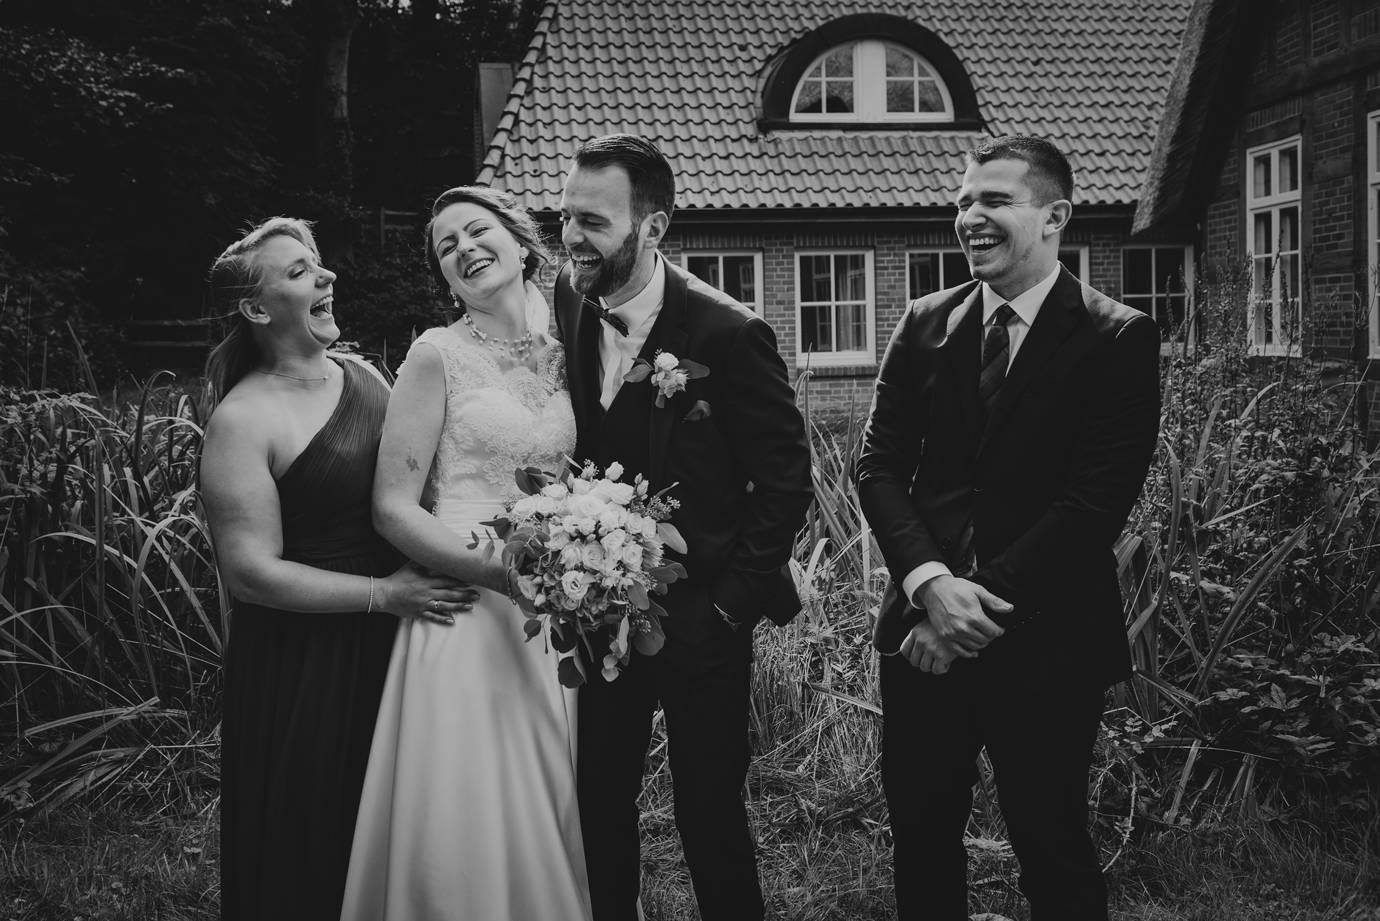 hochzeitsfotograf neu helgoland worpswede 101 - Marisa+Pascal